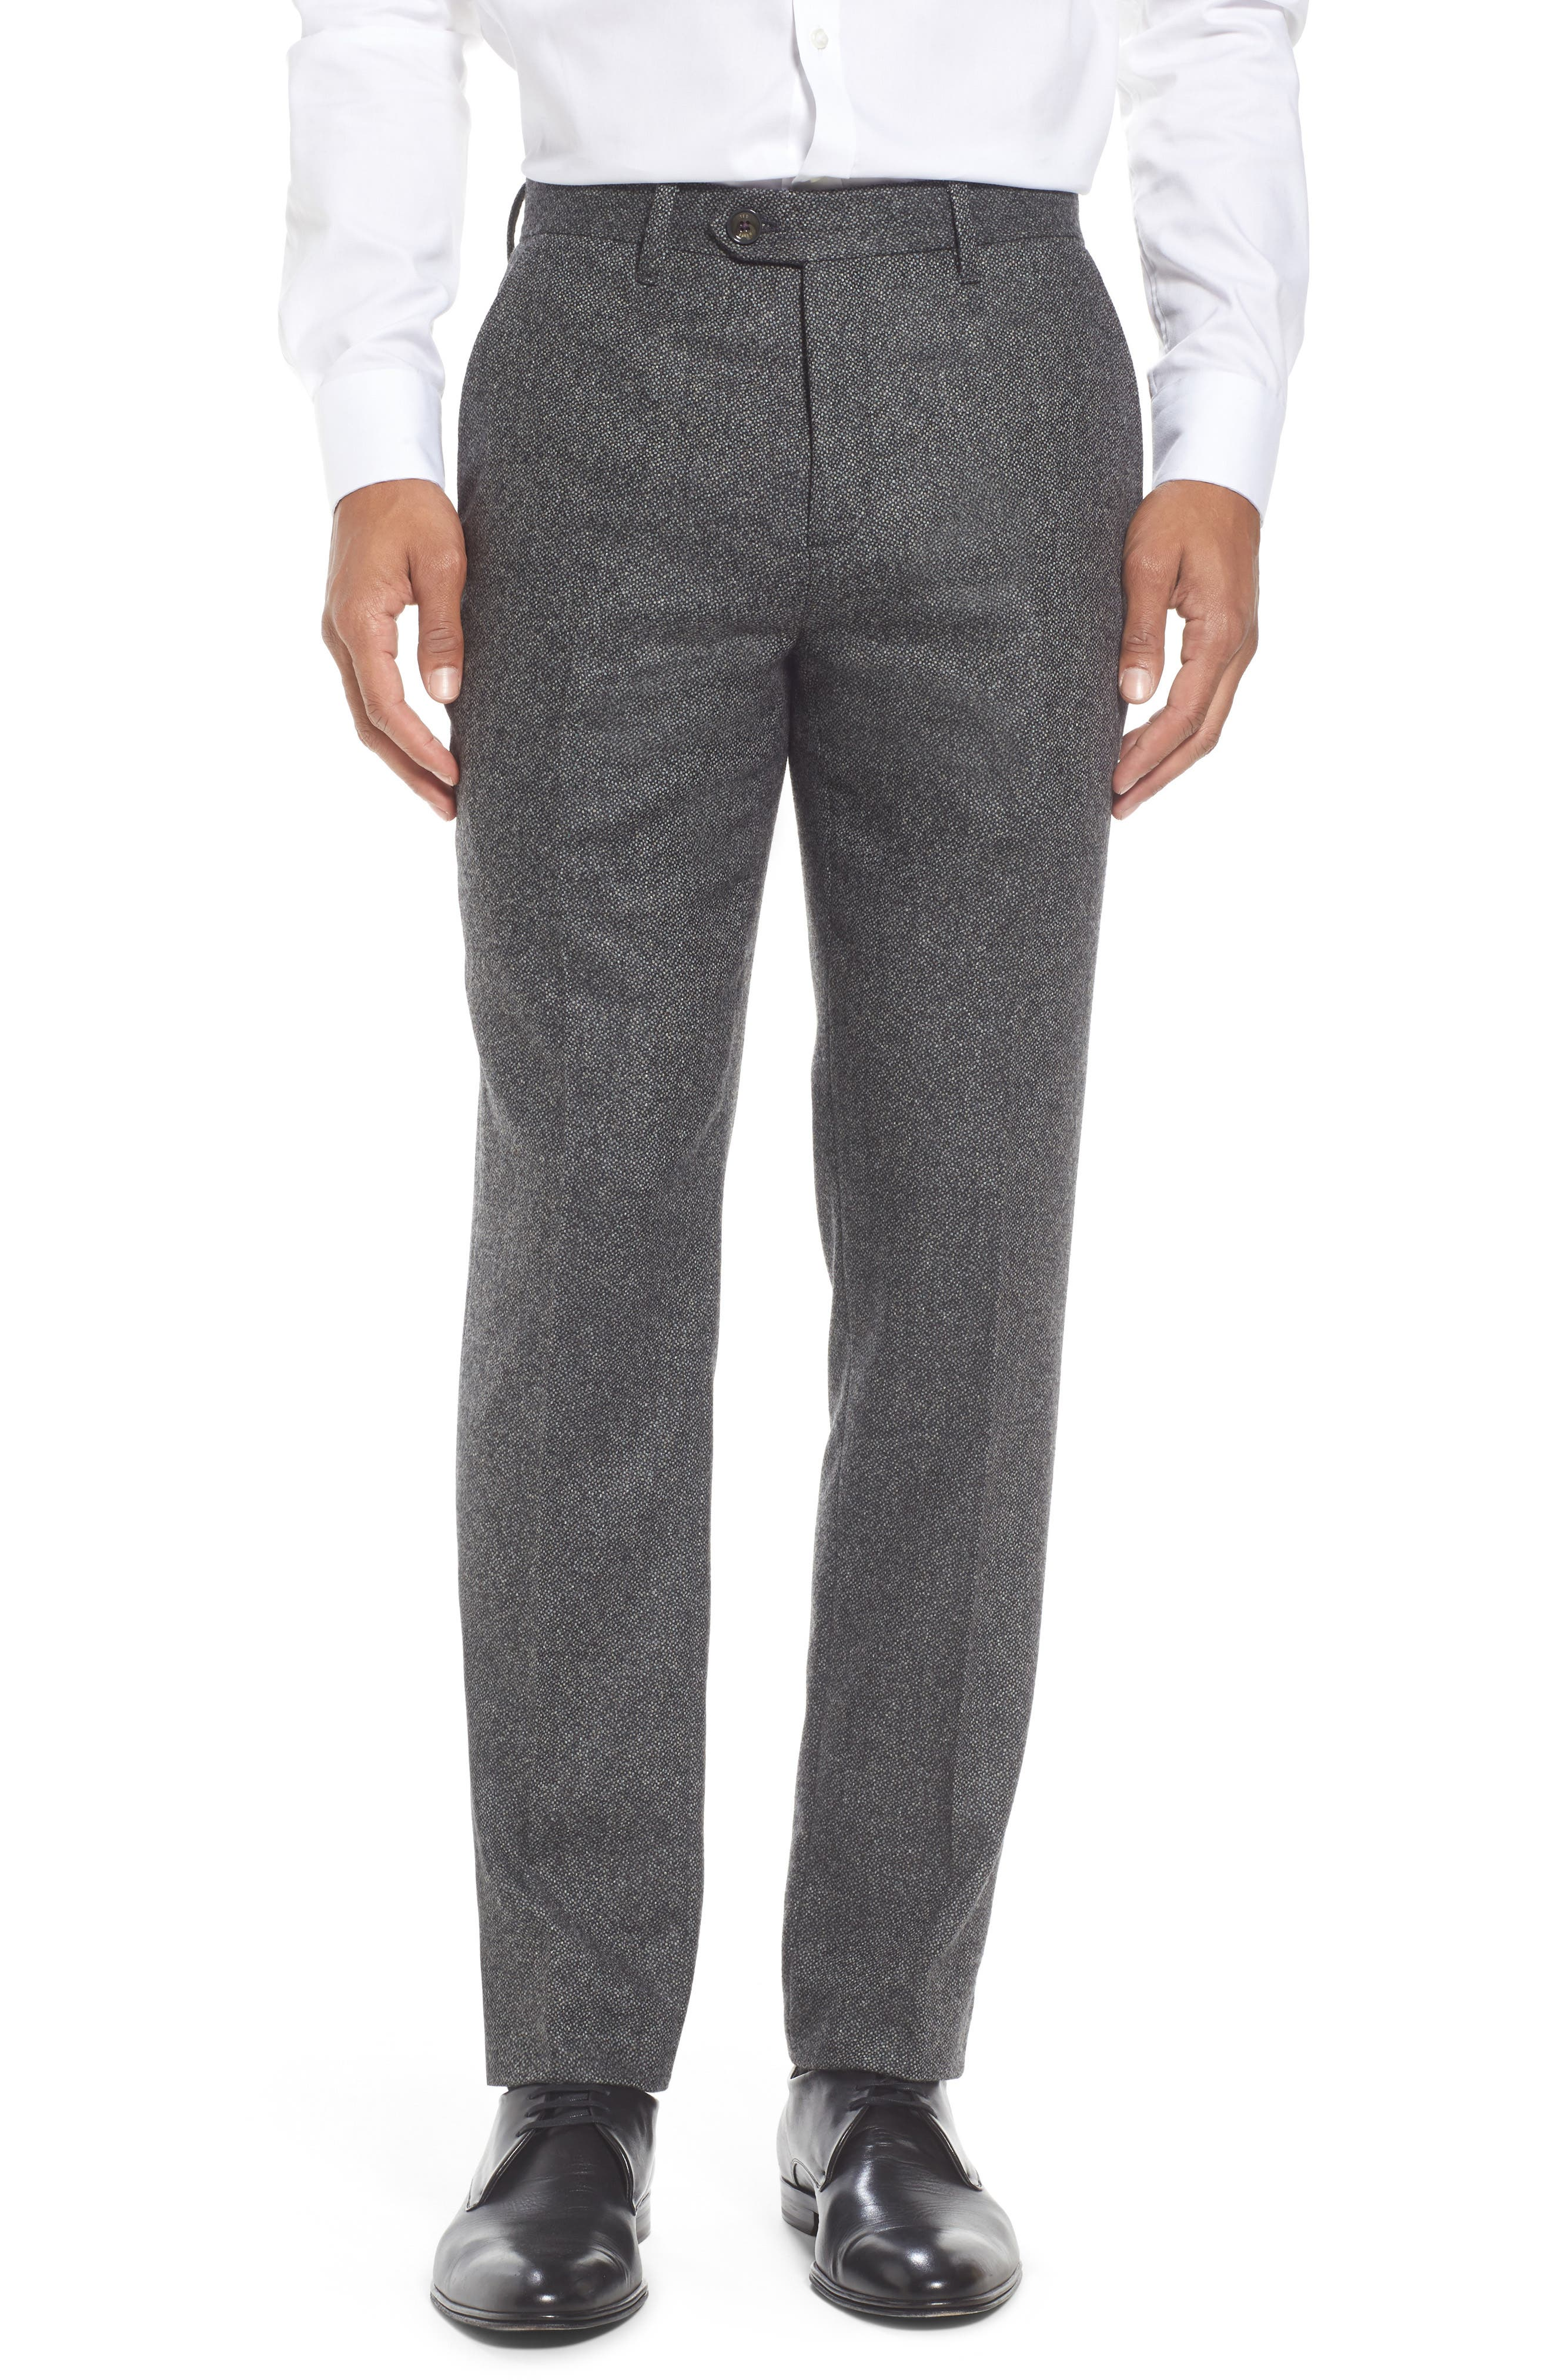 Modern Slim Fit Trousers,                             Main thumbnail 1, color,                             010